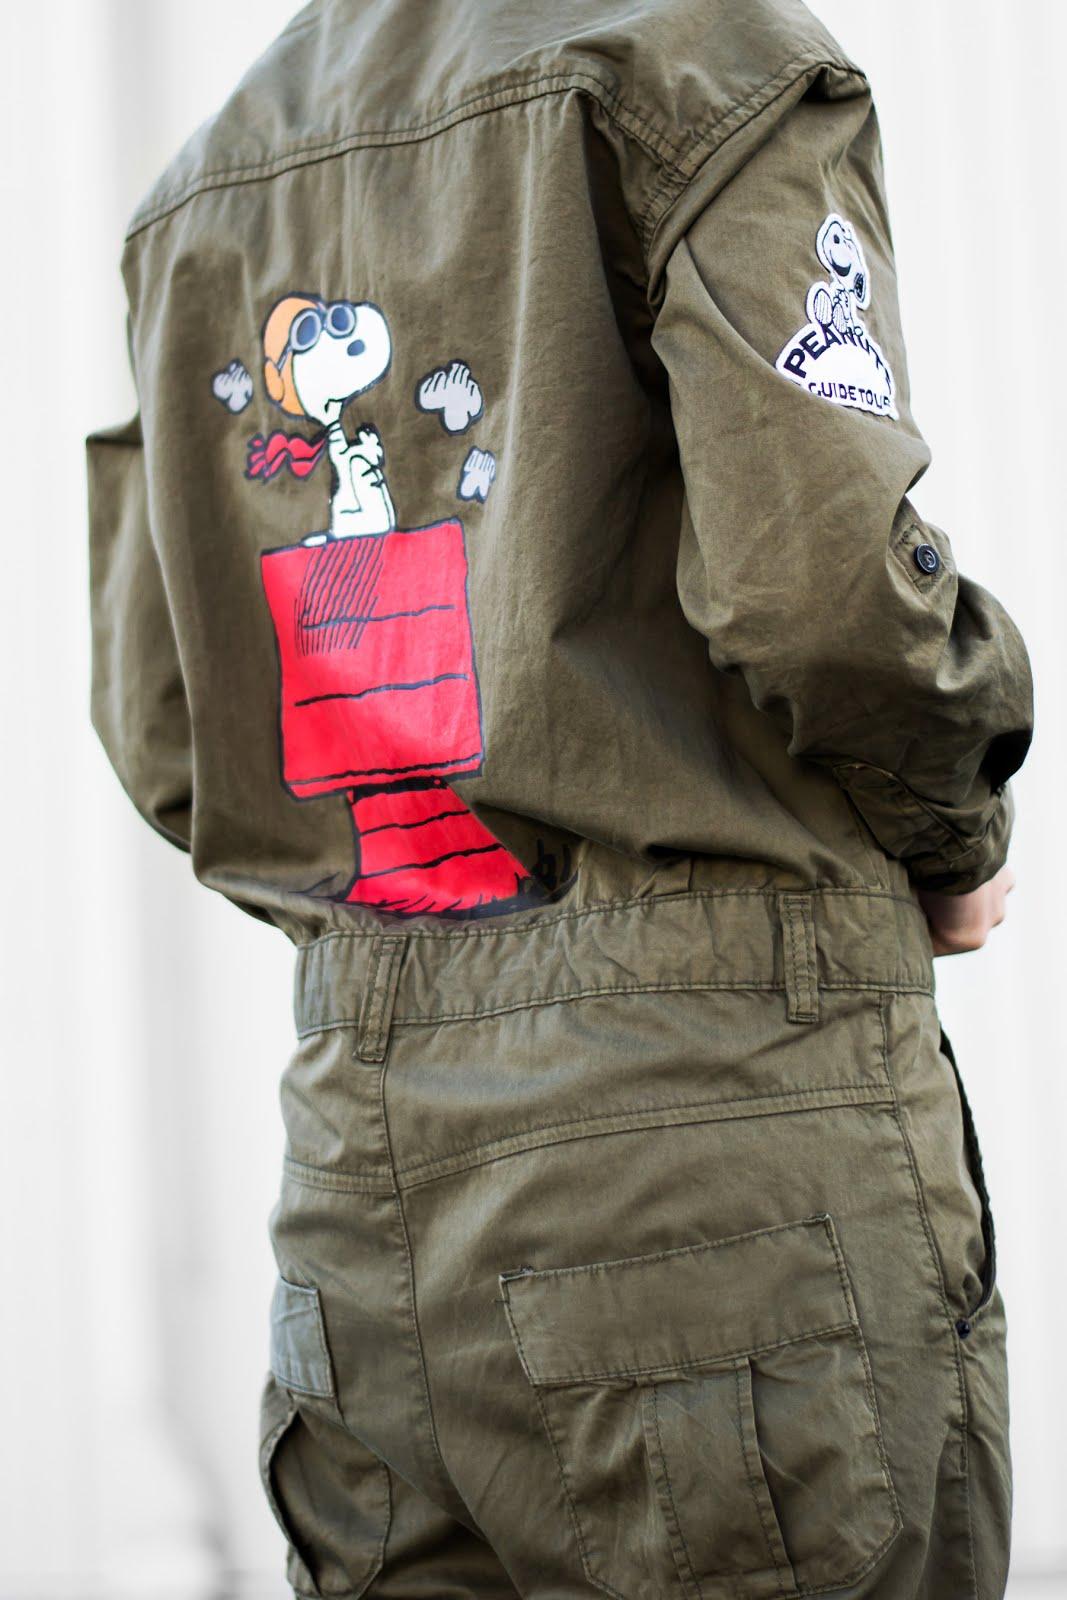 Peanuts boilersuit, jumpsuit, snoopy, zara trf, sale, khaki green, monochrome converse, all star, black, outfit, minimal